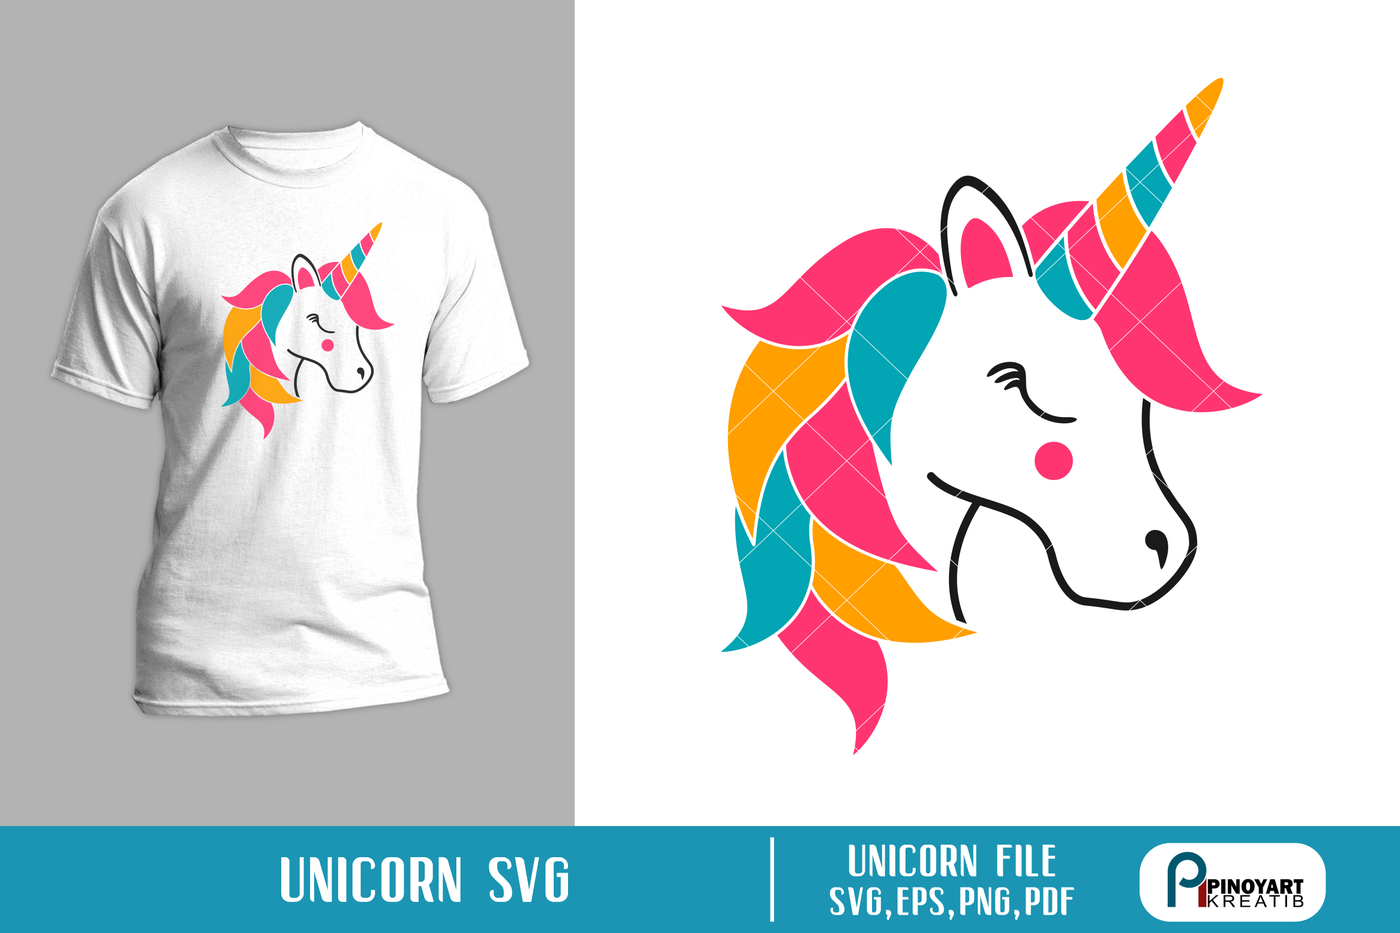 Unicorn Svg Unicorn Svg File Unicorn Clip Art Unicorn Graphics